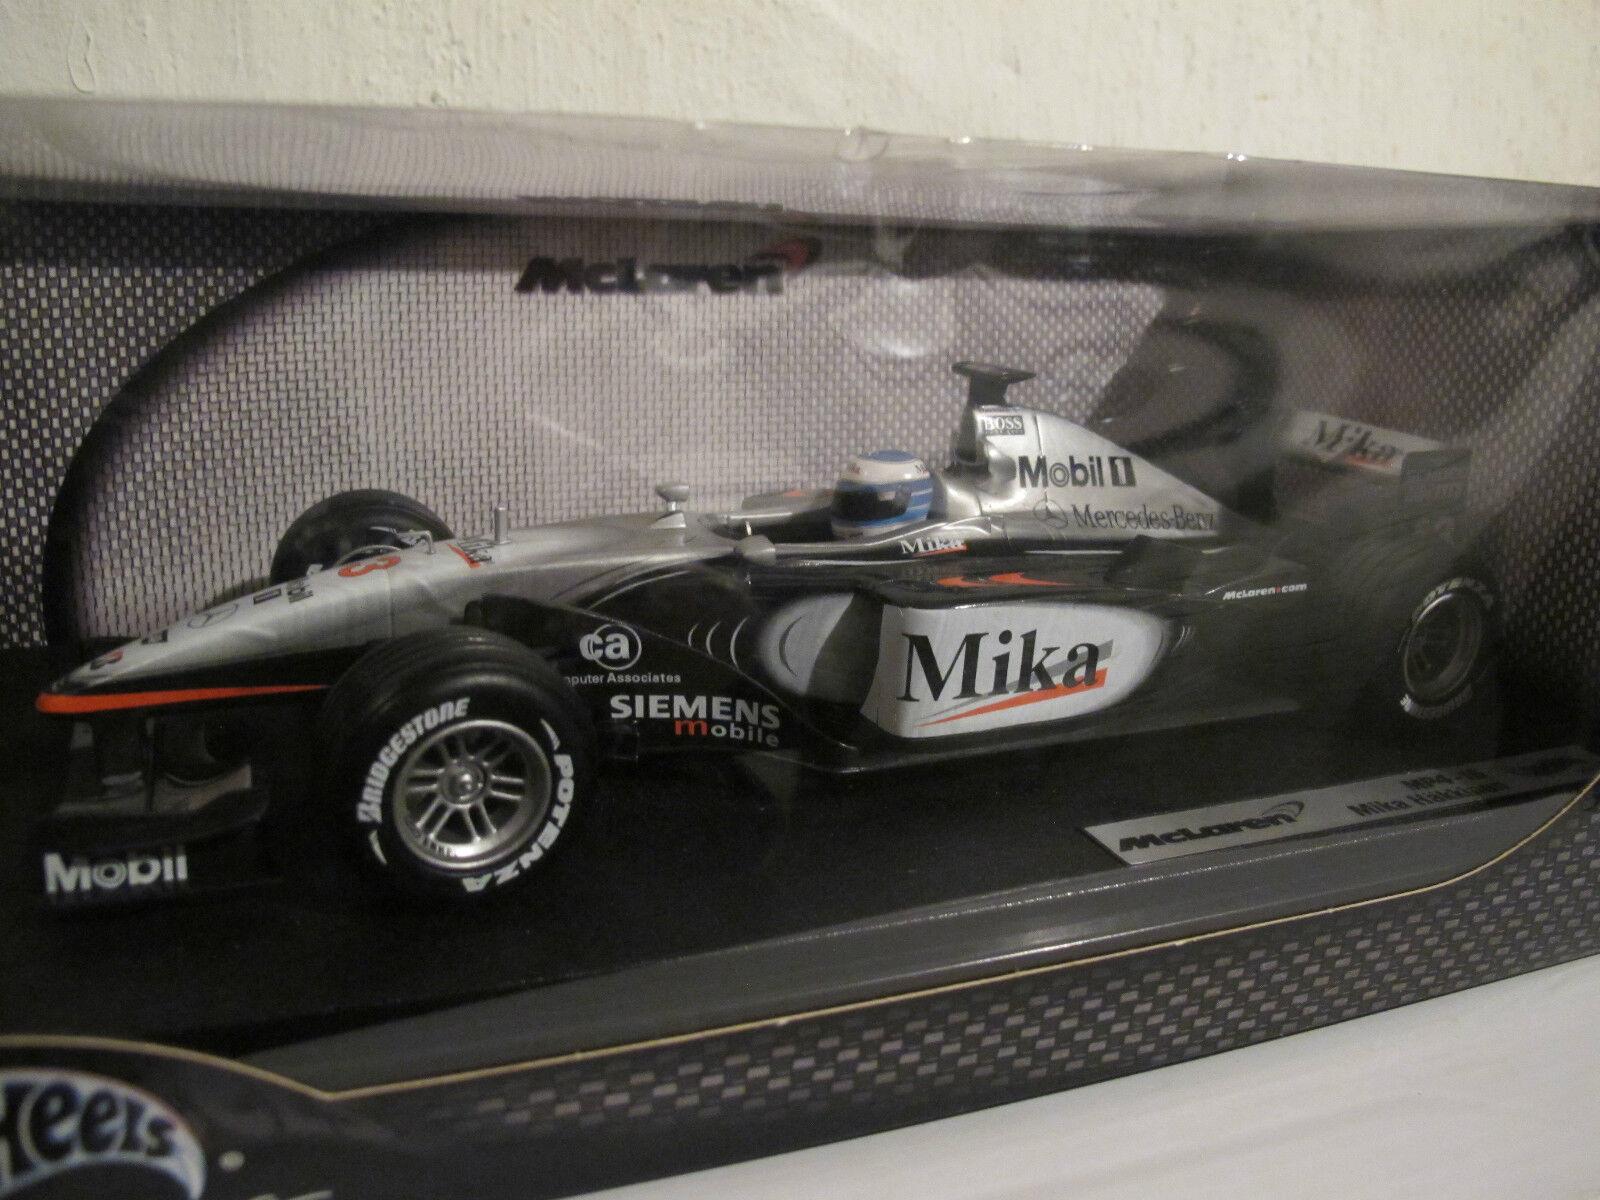 1 18 mclaren mp4-16, Mika Häkkinen, personaje & cigarrillos, Hot Wheels, nuevo & OVP rar